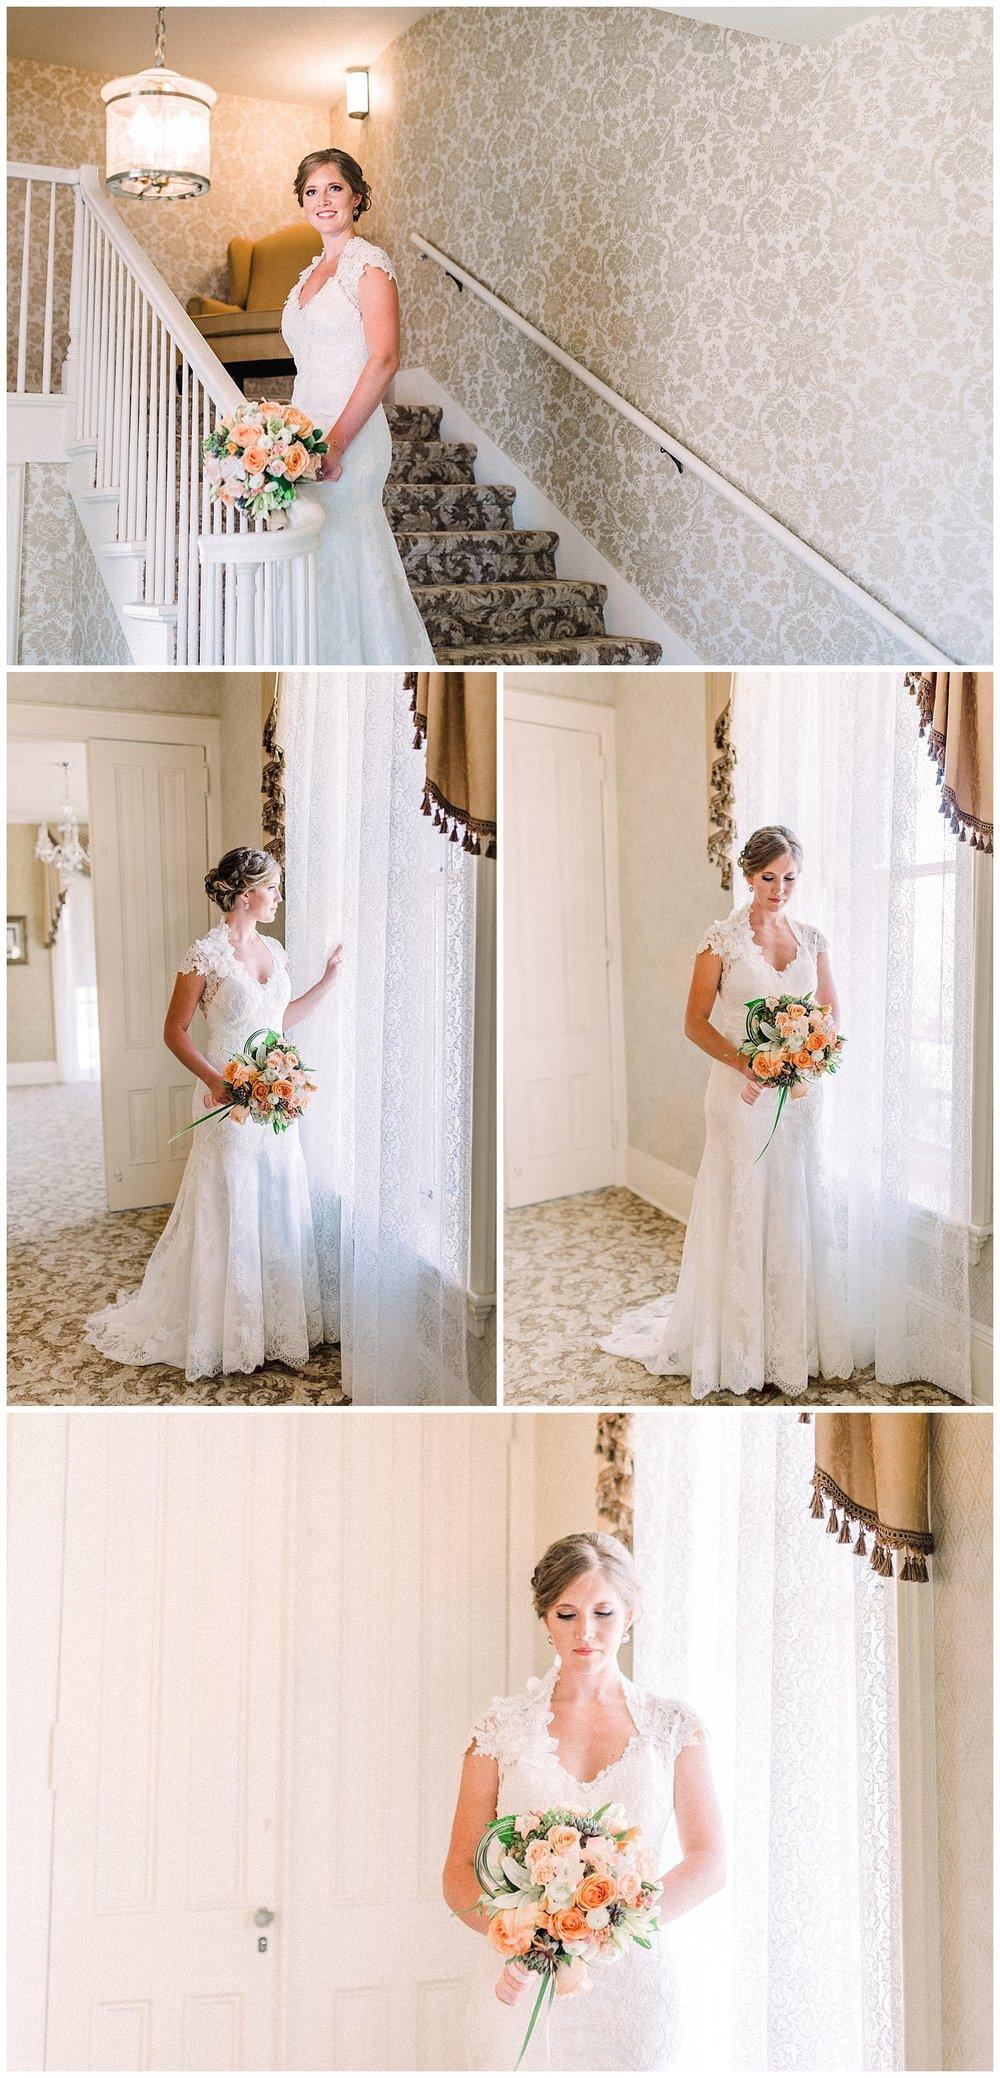 Nicole Corrine Iowa Wedding Photographer Snowden House Wedding Waterloo Iowa 7.jpg